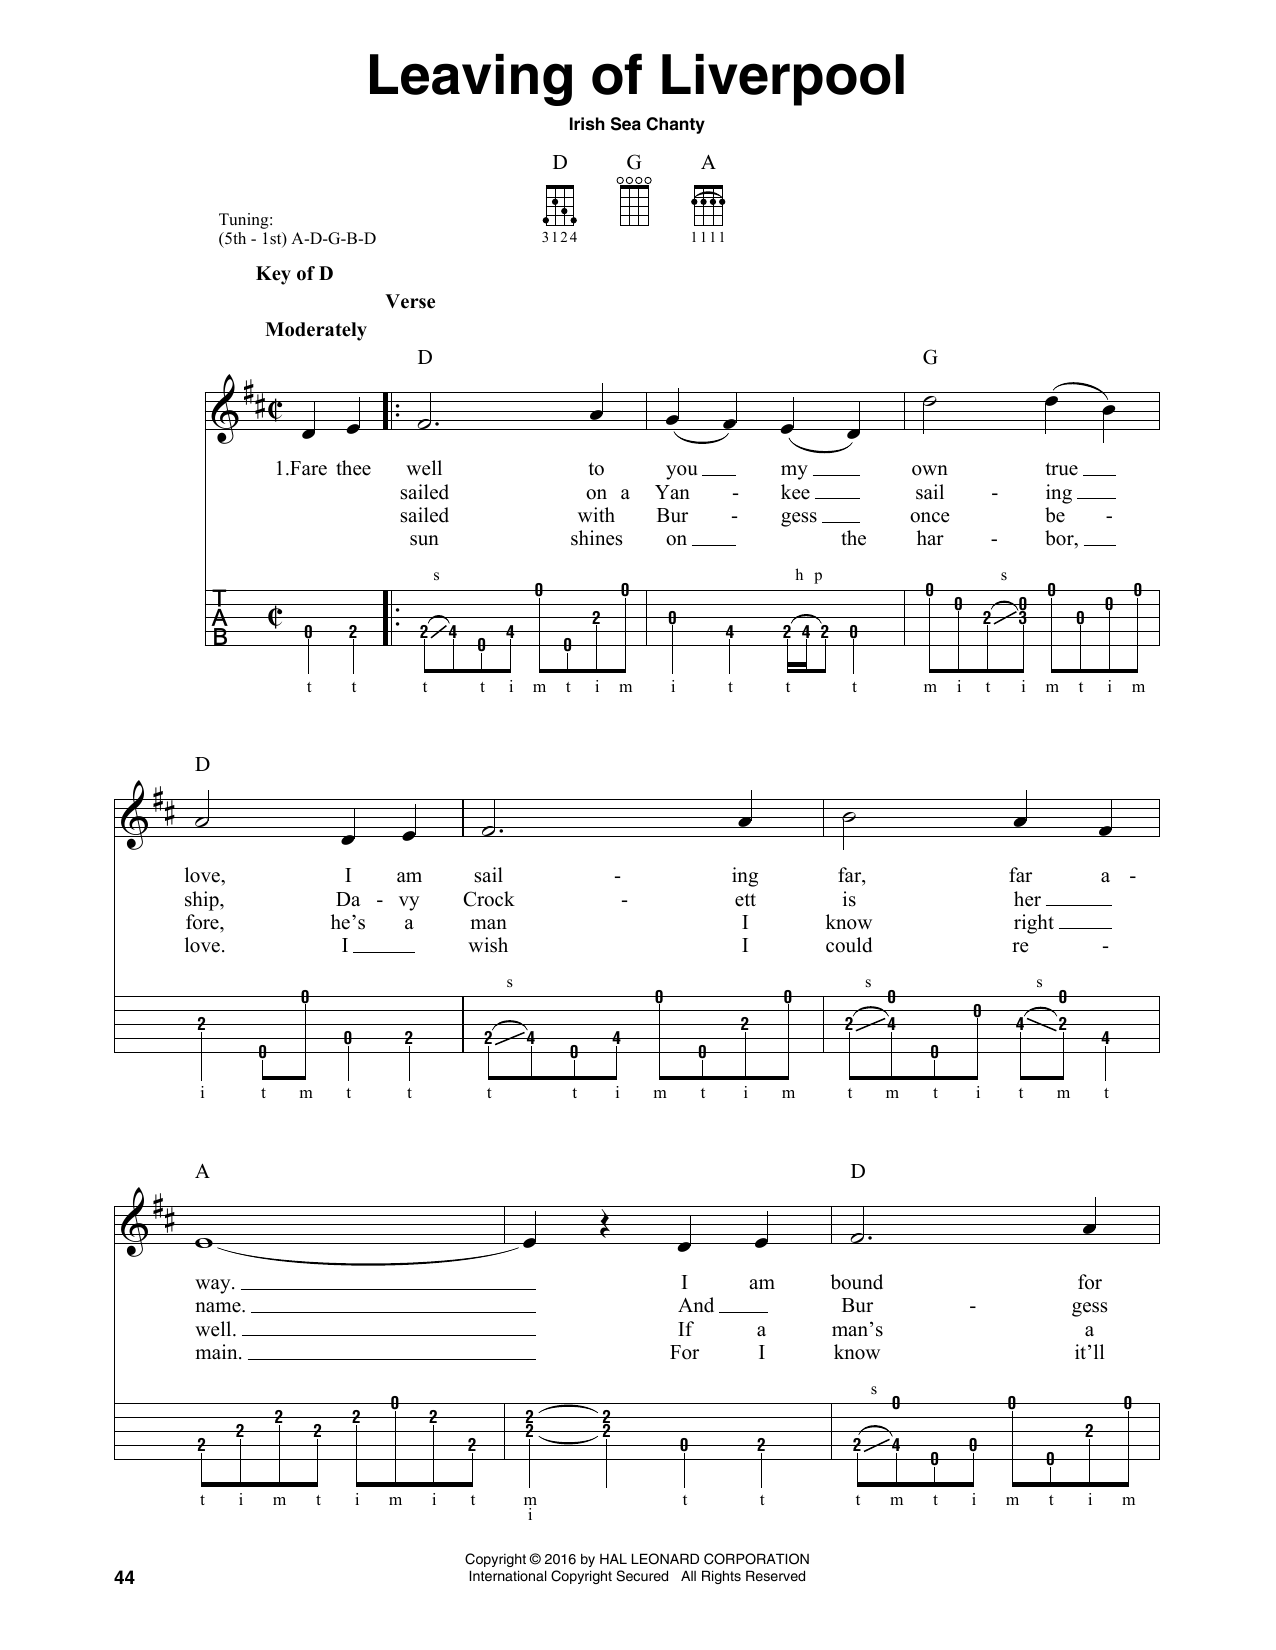 Irish Sea Shanty Leaving Of Liverpool sheet music notes and chords. Download Printable PDF.